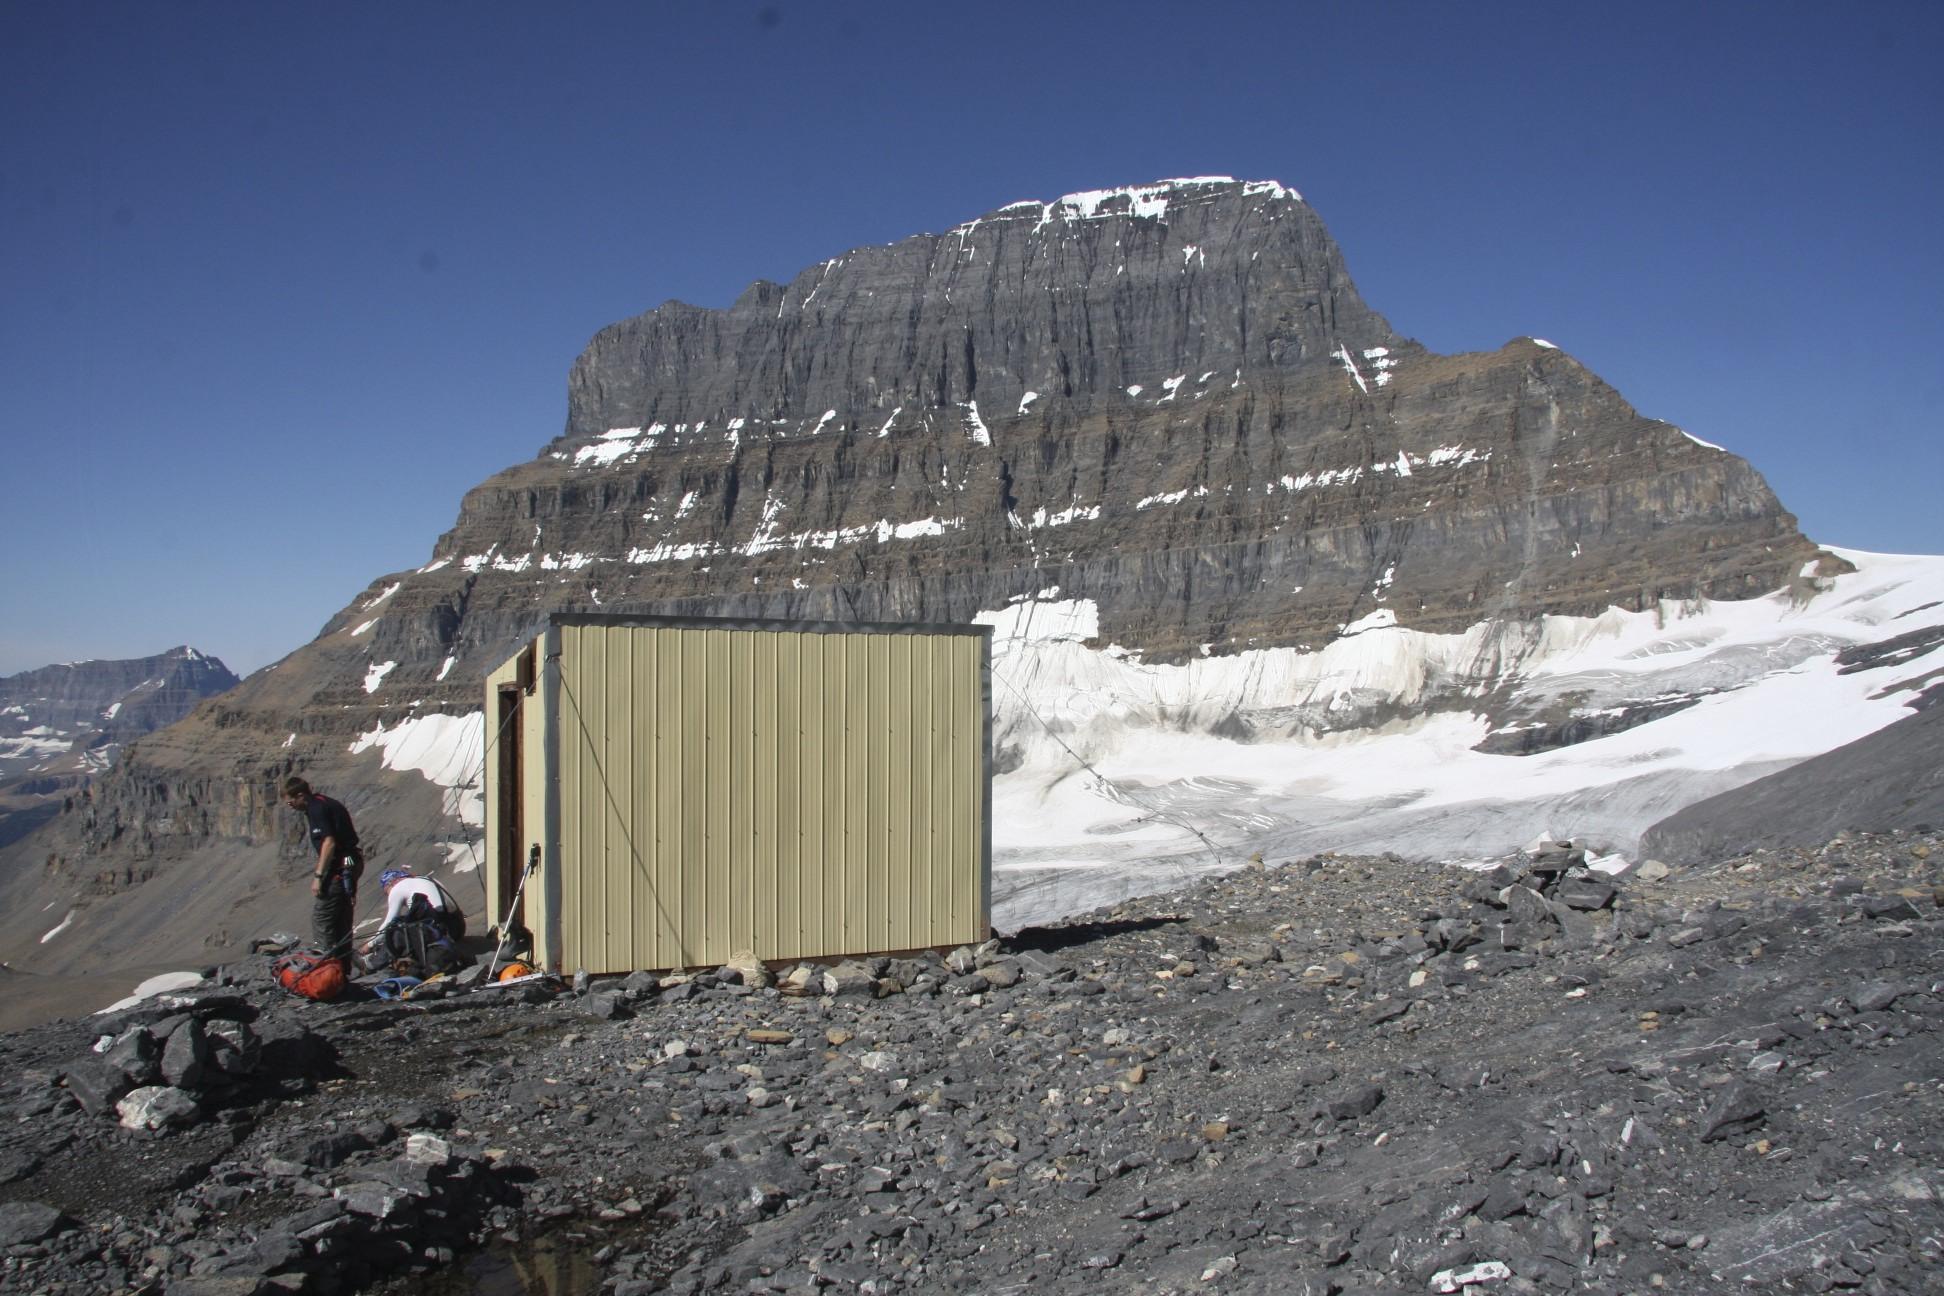 The ACC hut and Mt. Alberta